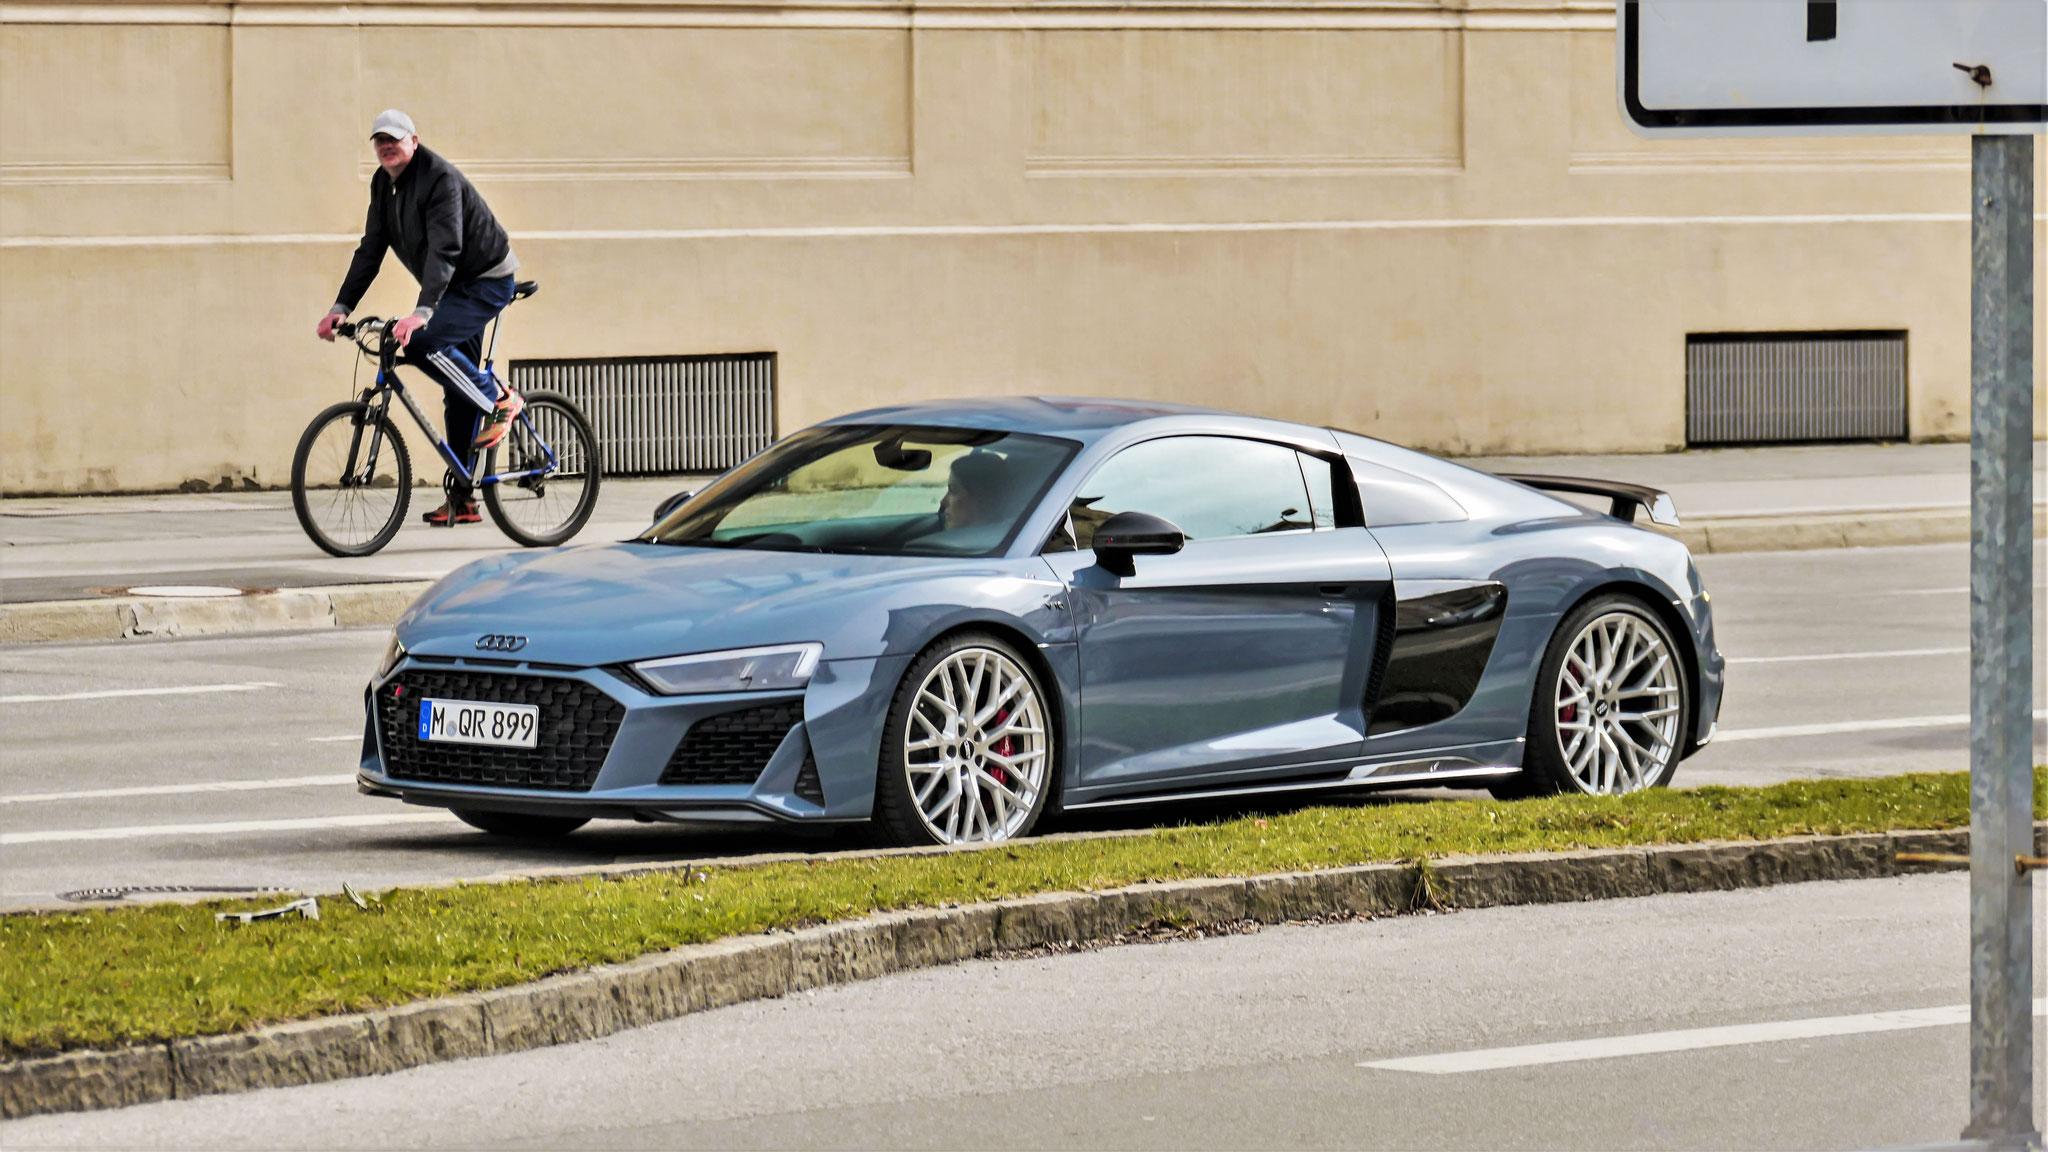 Audi R8 V10 - M-QR-899